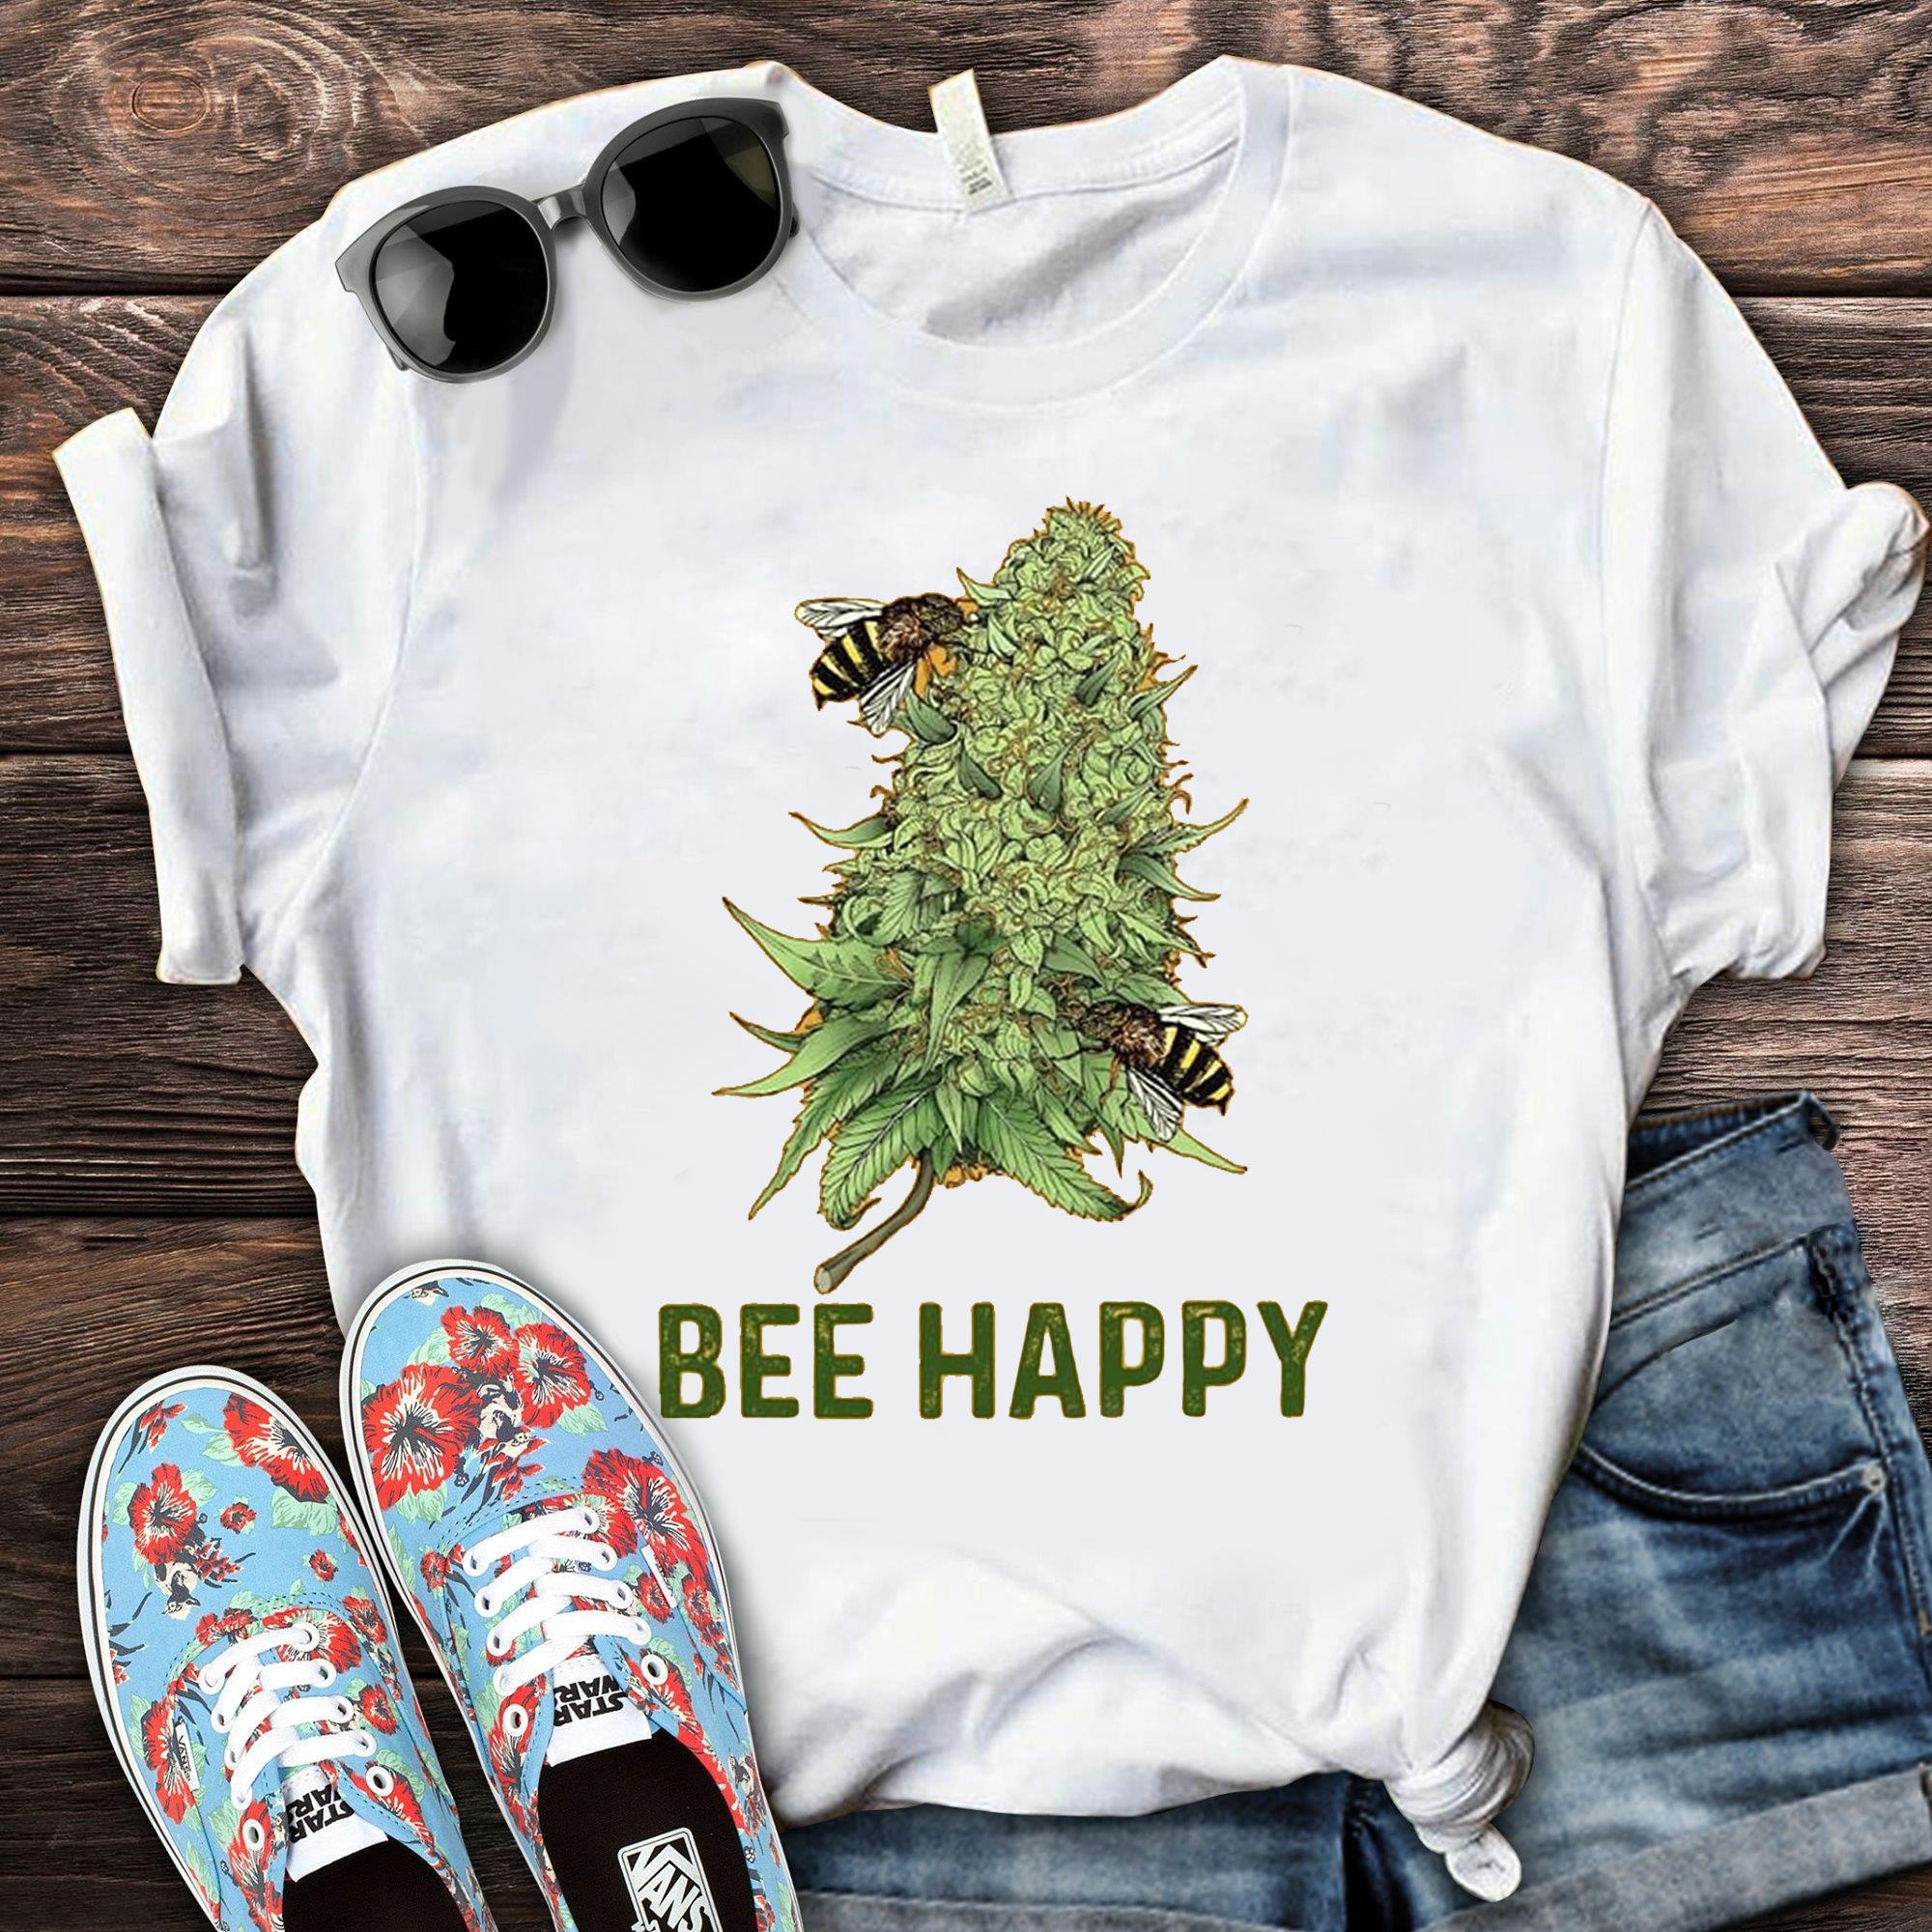 Bee Happy Cannabis Shirt